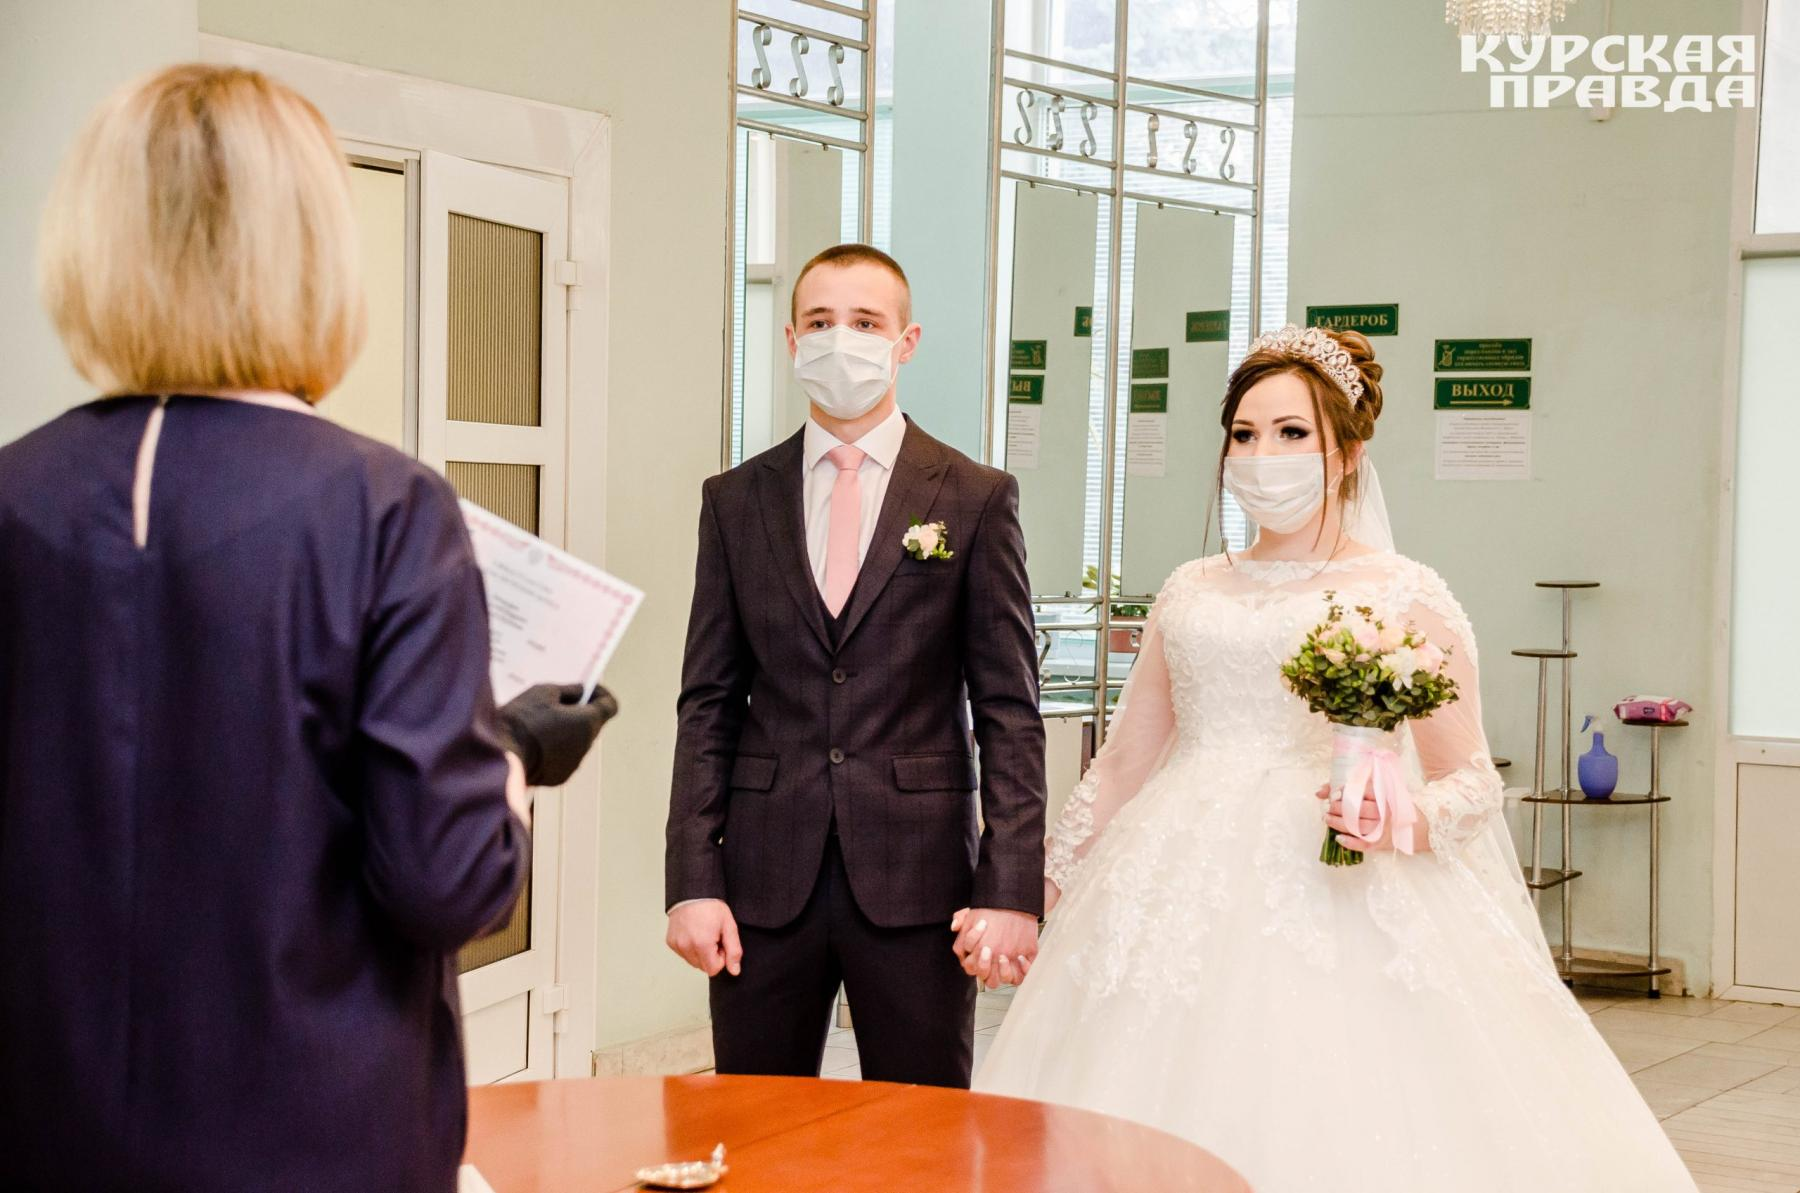 фото Свадьба на двоих: новосибирские ЗАГСы не пустят гостей до конца августа 2